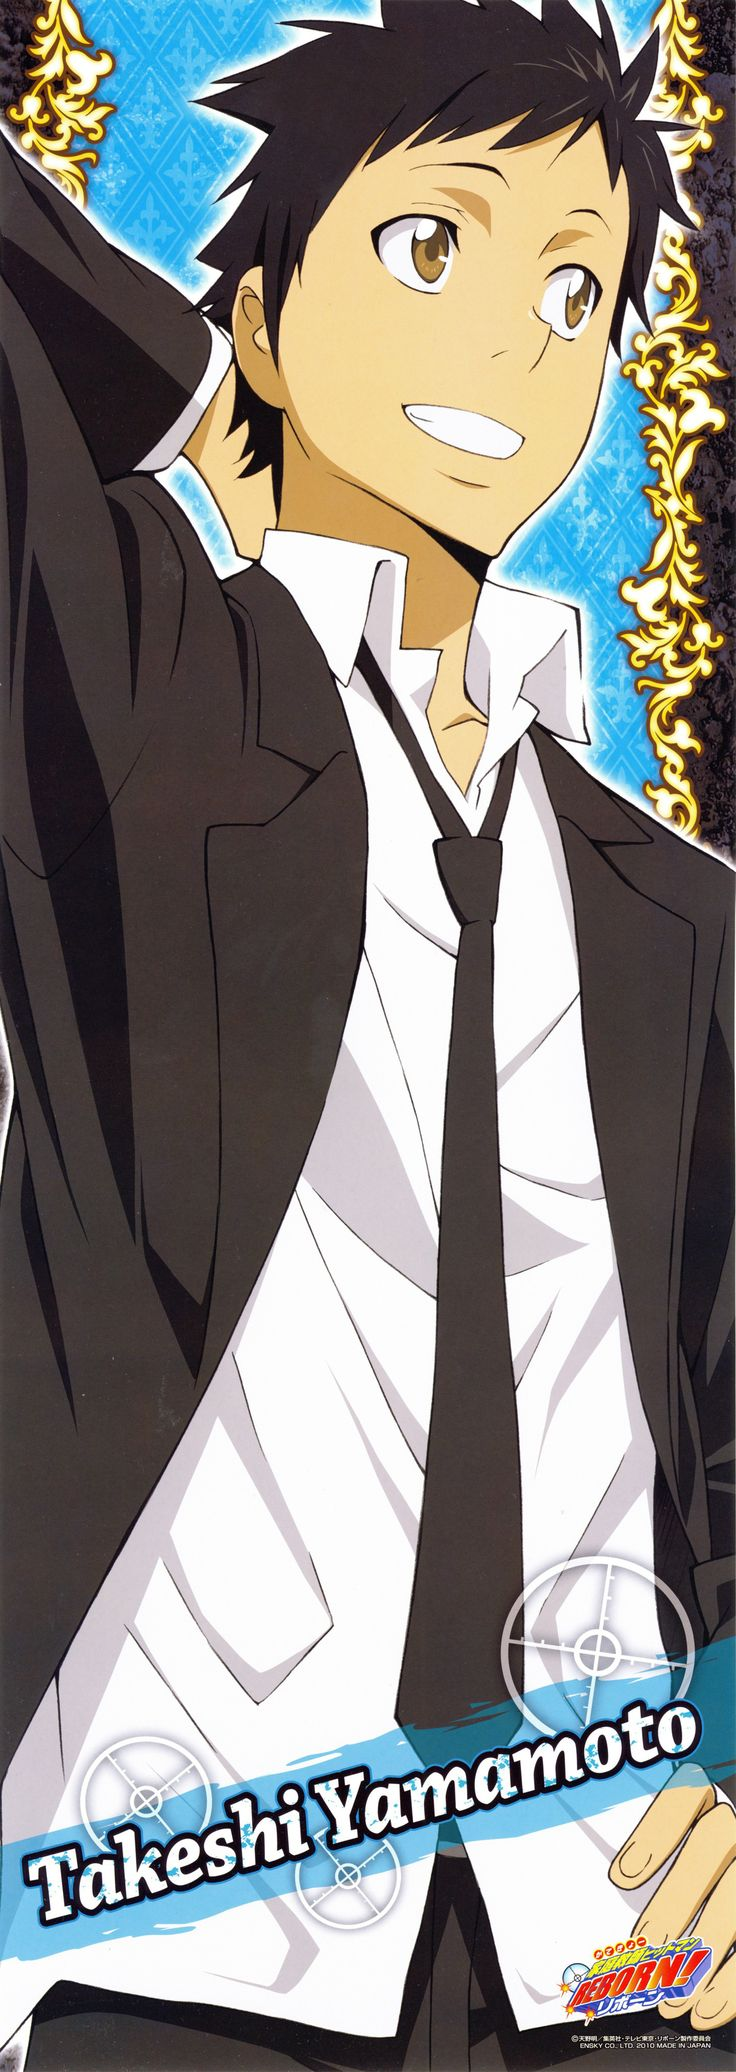 Takeshi YamamotoYamamoto Takeshi Smile